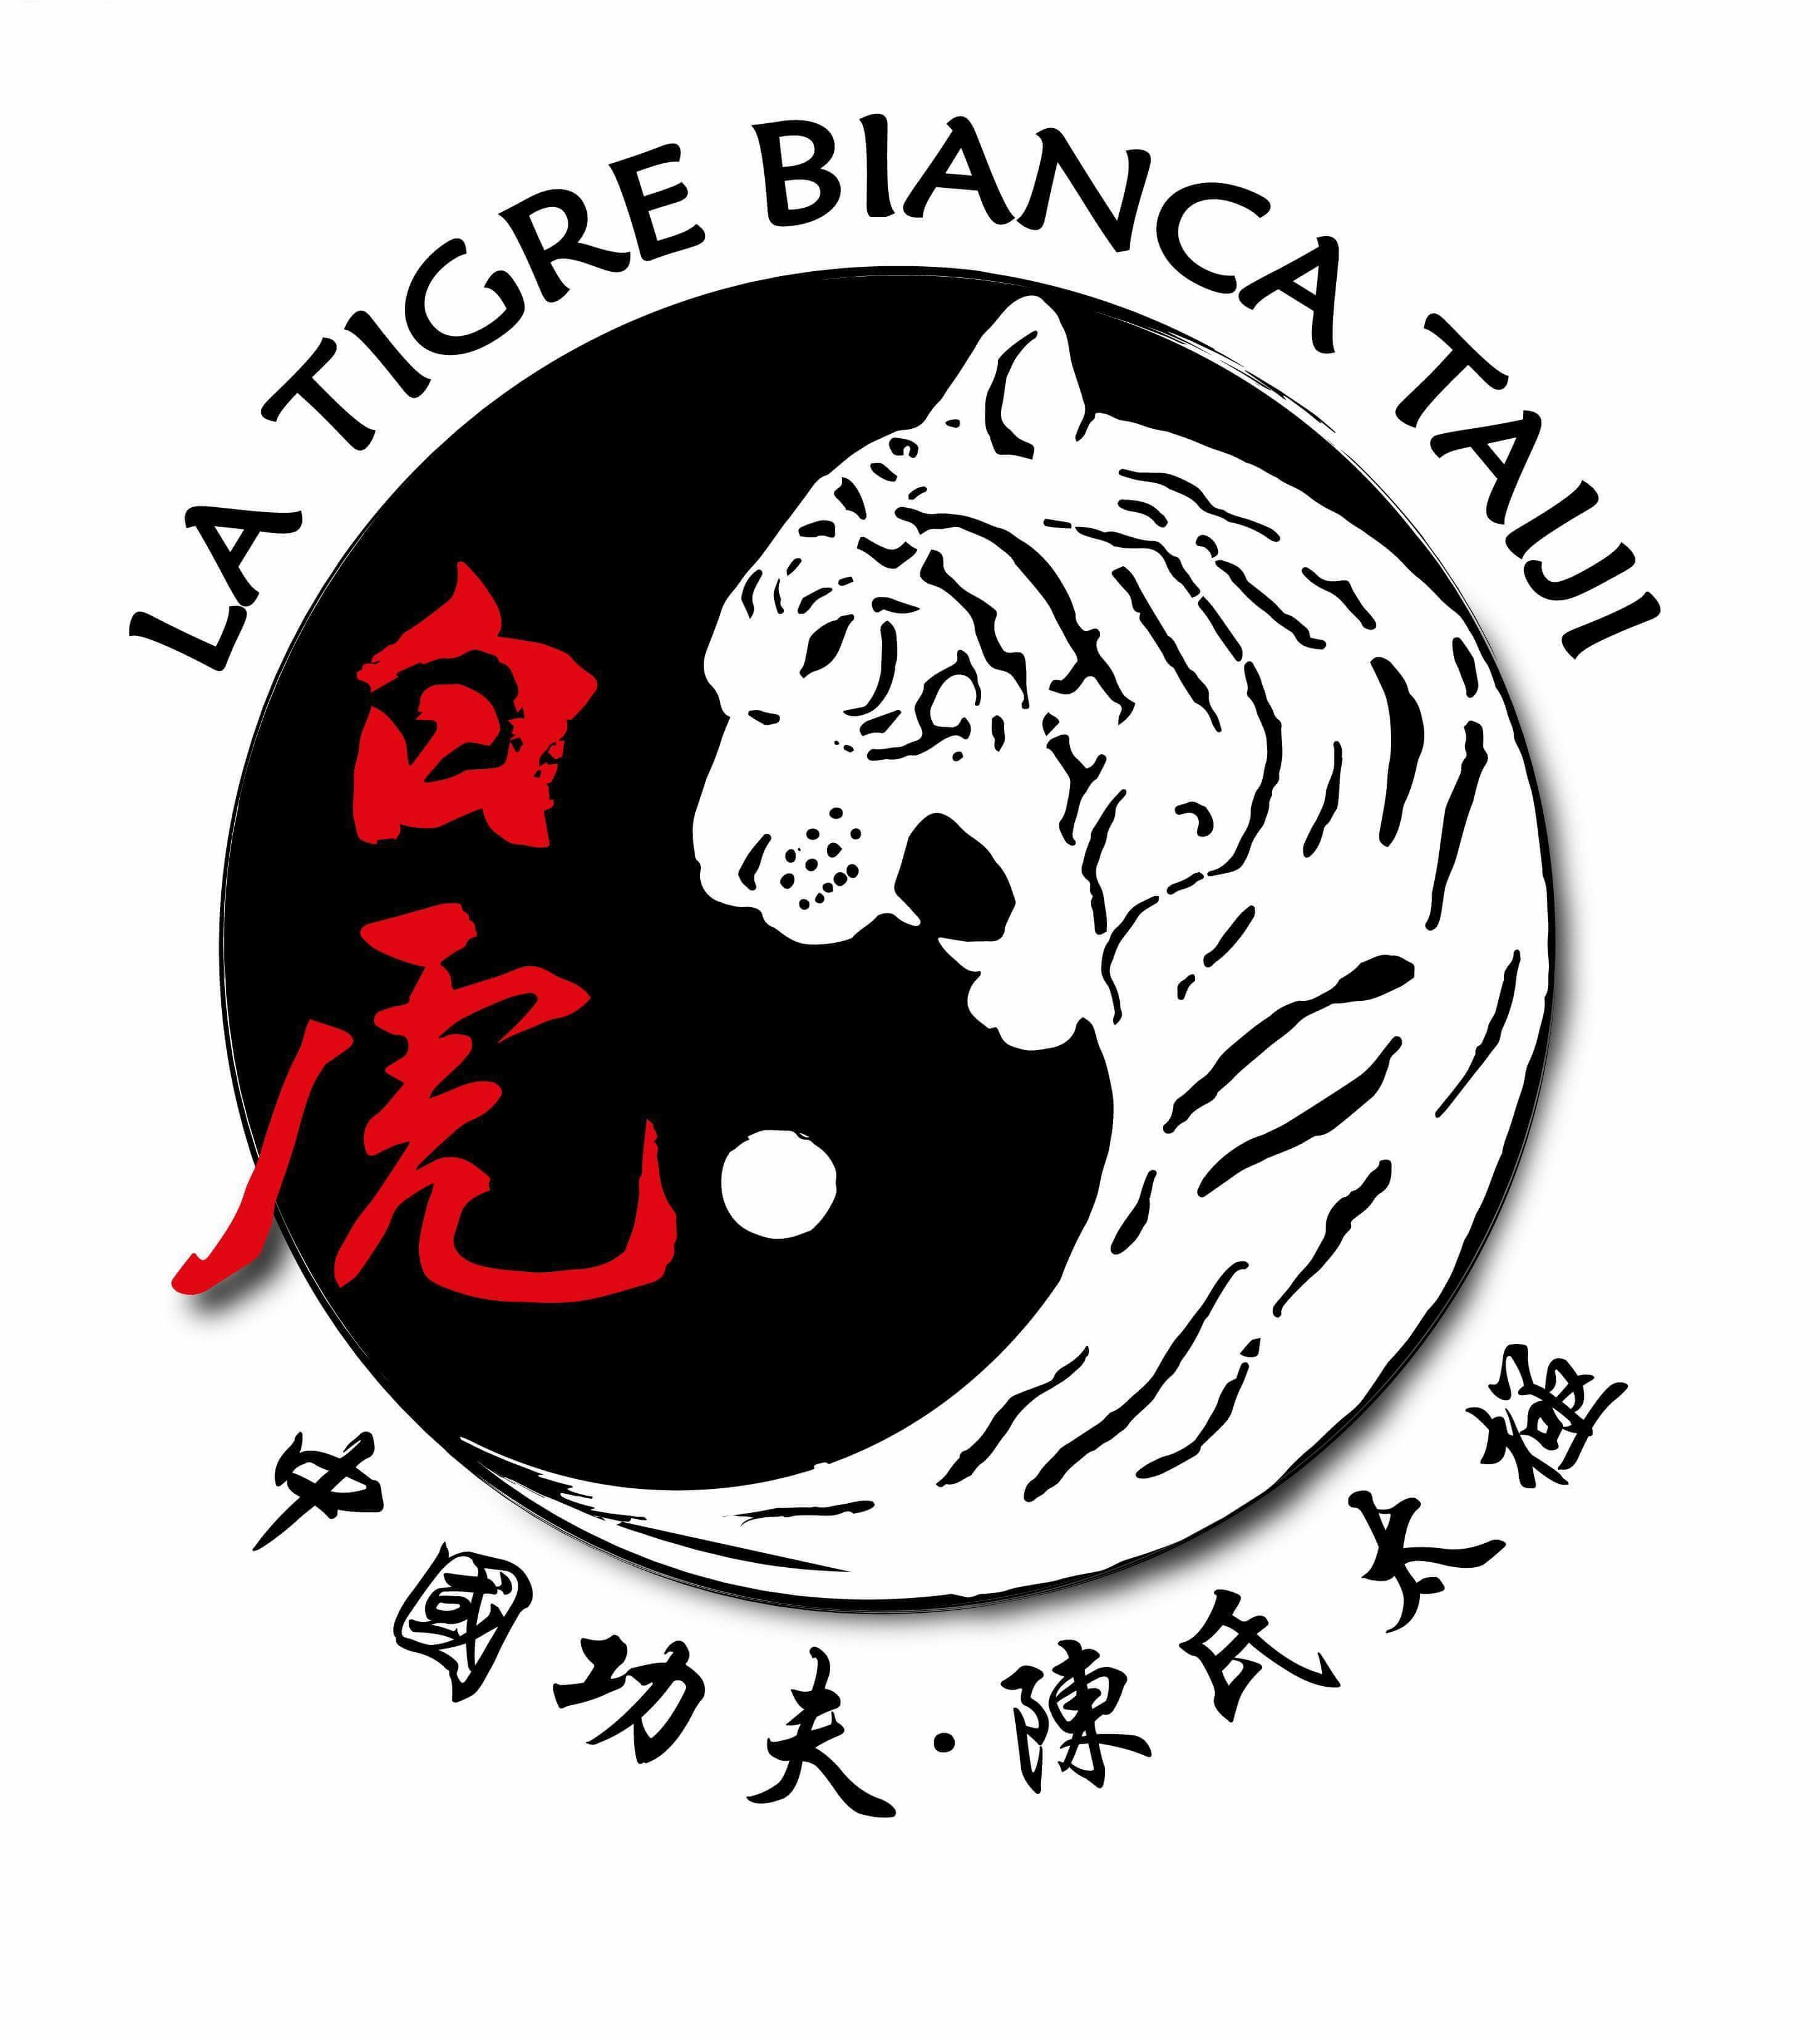 La Tigre Bianca Taiji